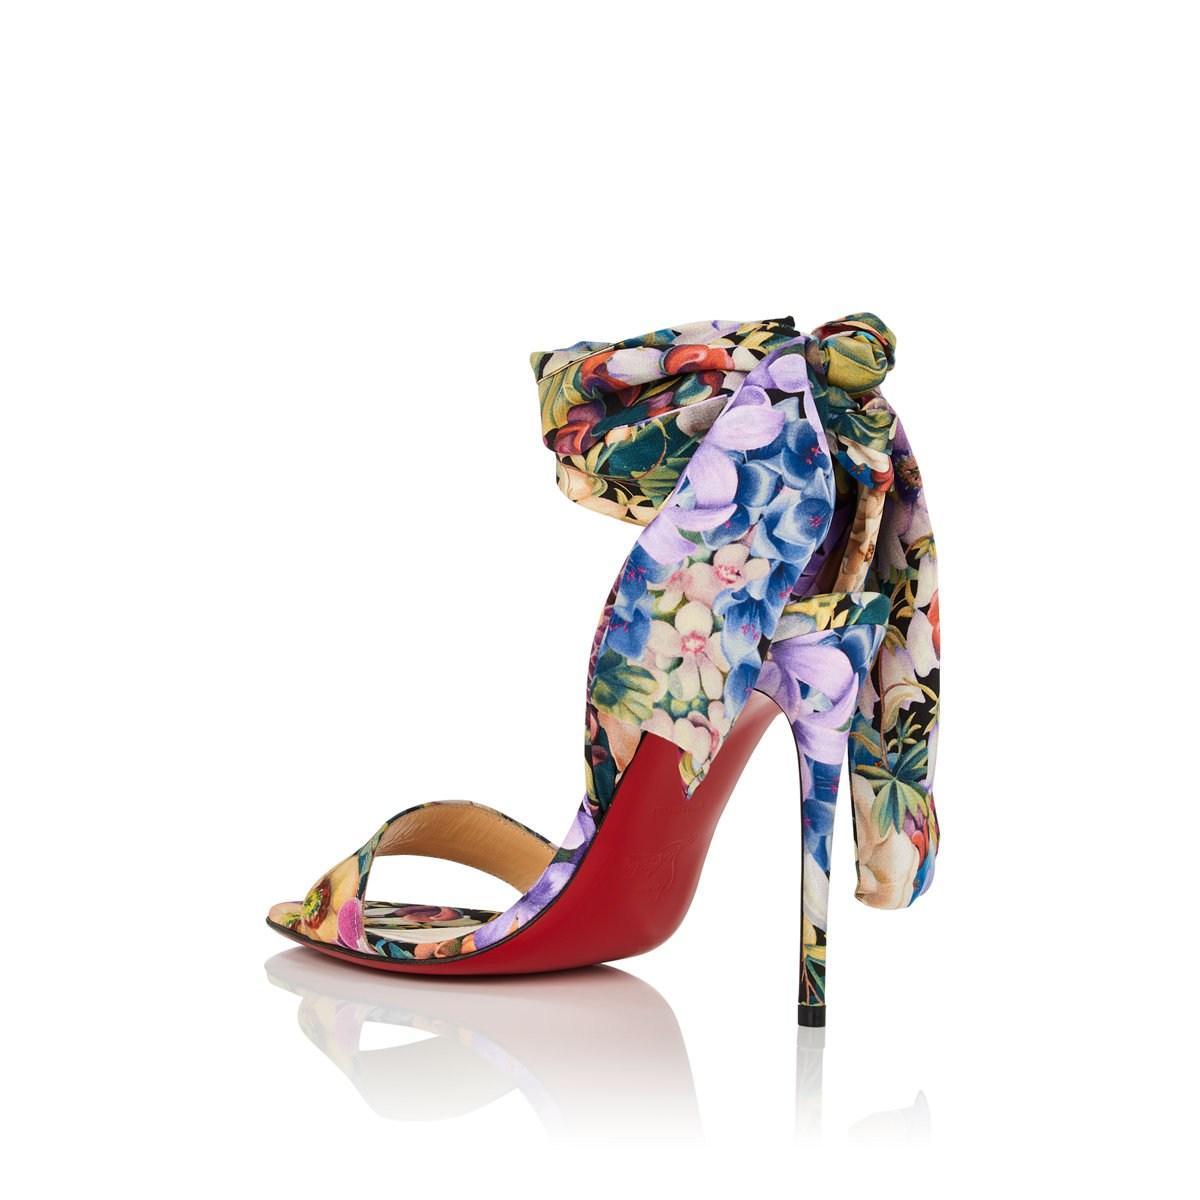 260ab4f89469 Christian Louboutin - Blue sandale Du Desert Floral Crepe Sandals Size 6 -  Lyst. View fullscreen